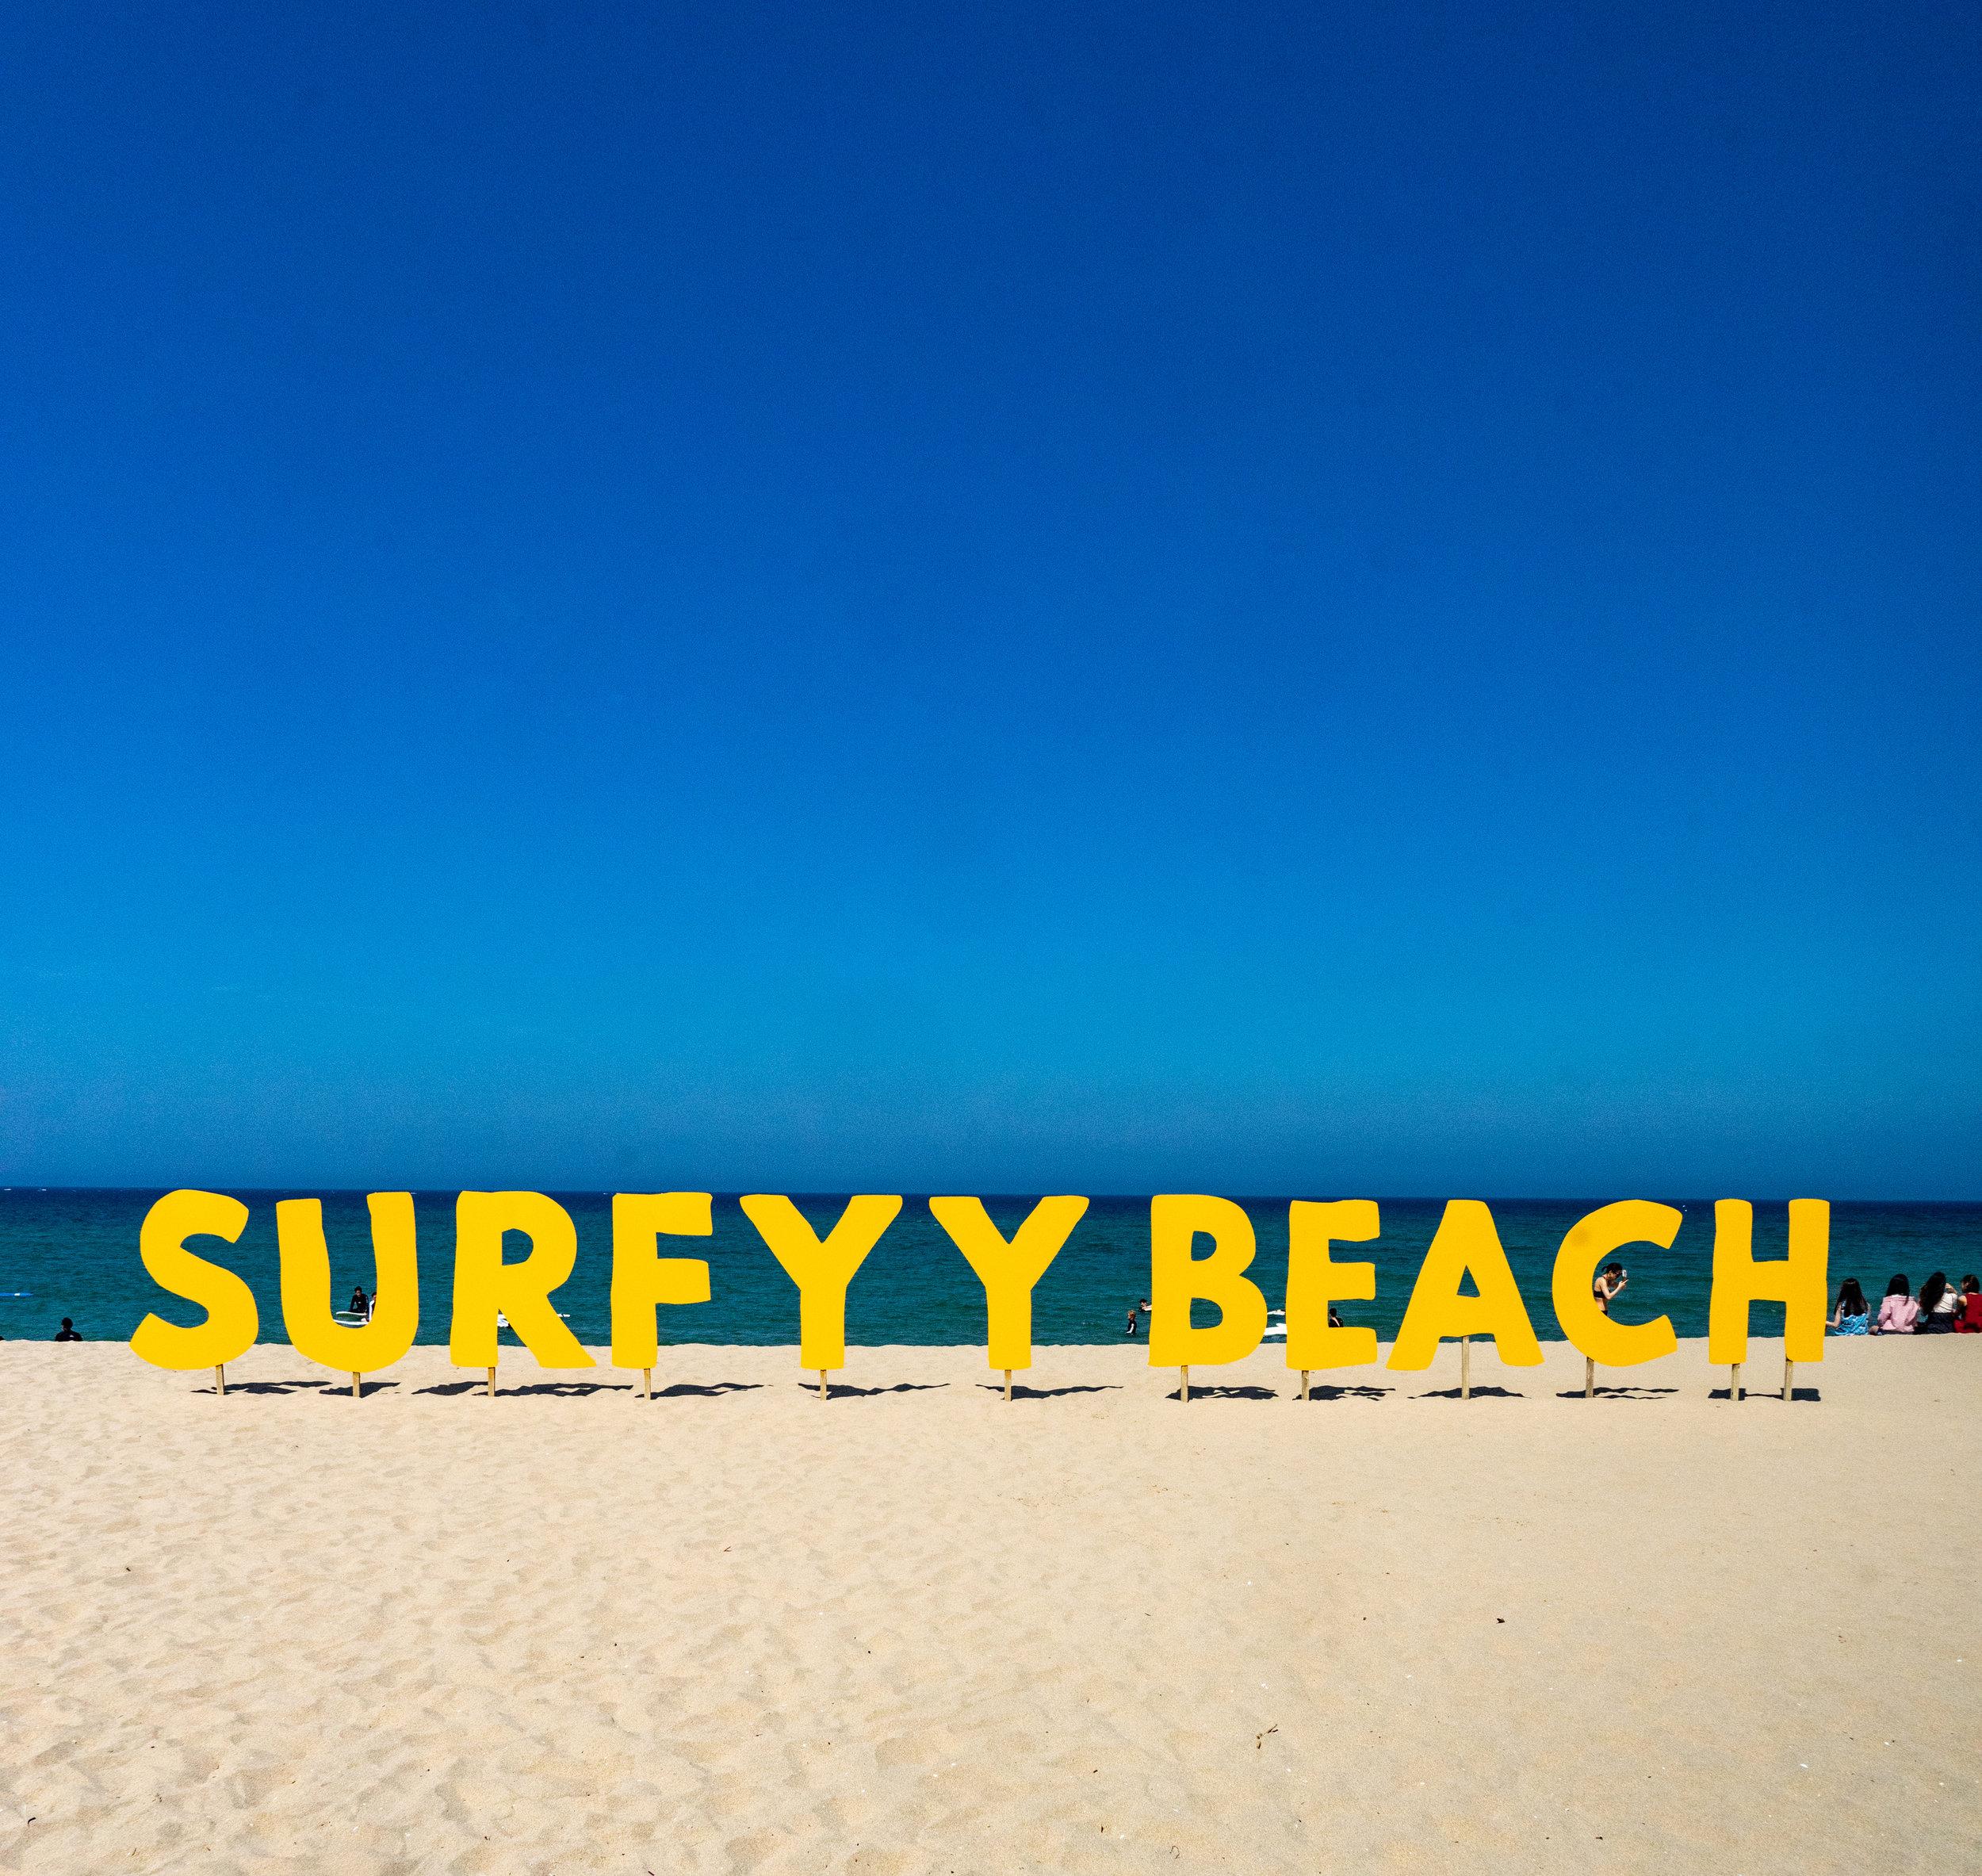 Surfyy Beach - '19 Summer Cover Story